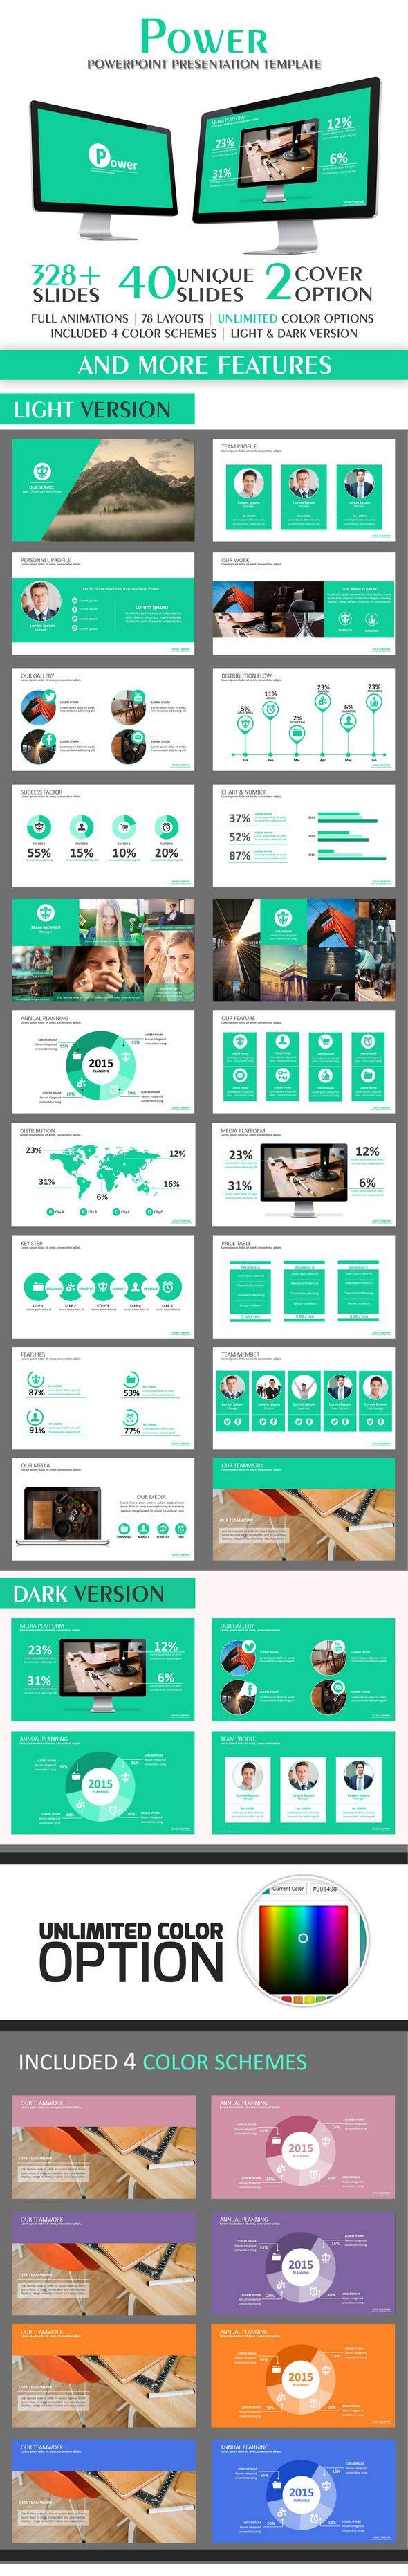 Power PowerPoint Tempalte #design #slides Download: http://graphicriver.net/item/power-powerpoint-template/12607075?ref=ksioks